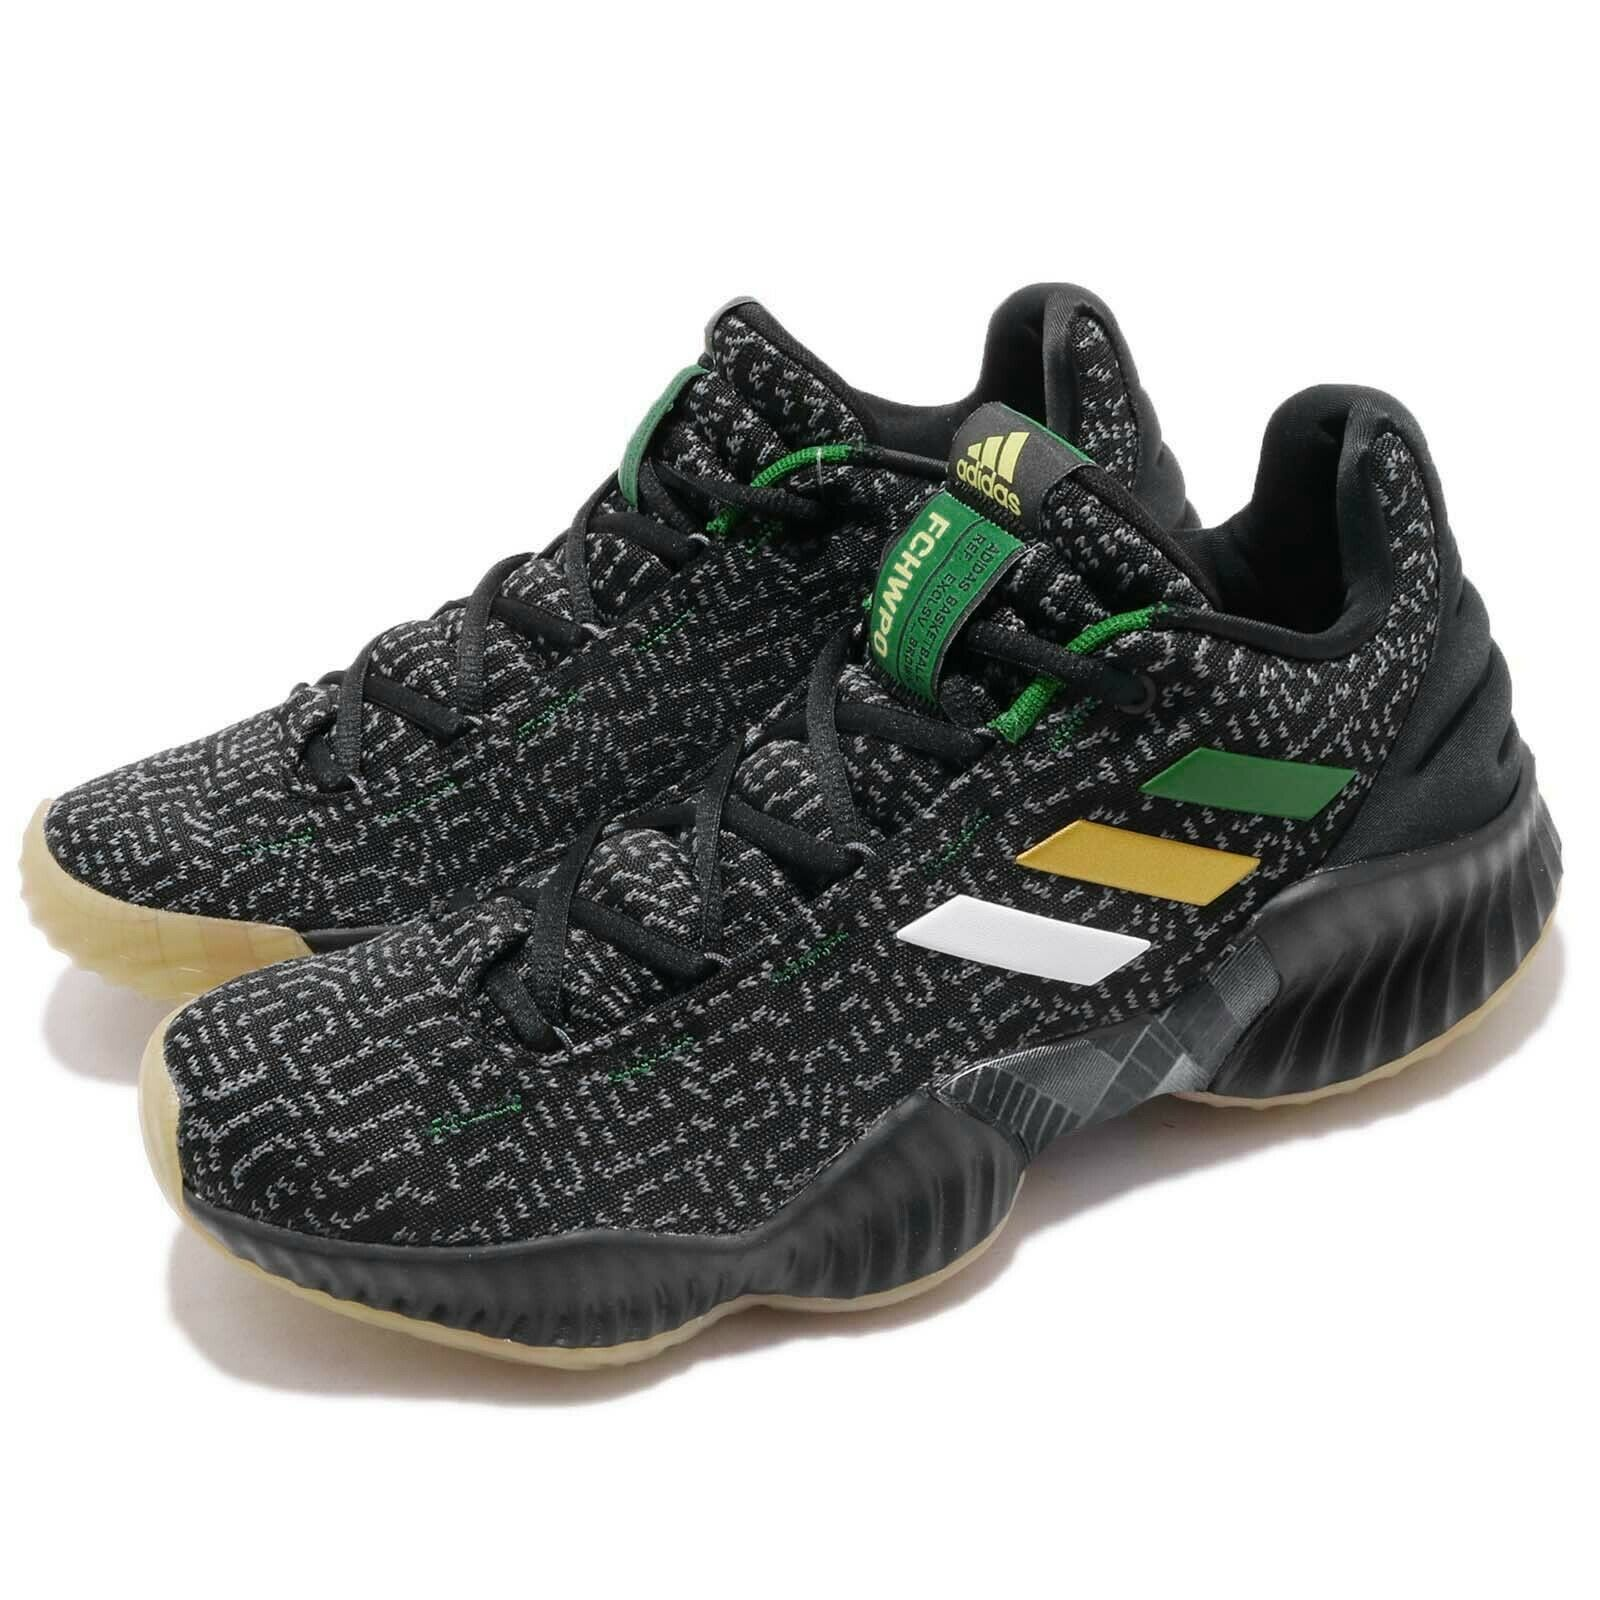 Adidas PB Pro Bounce Bounce Bounce 2018 Low Men Basketball shoes Sneakers Pick 1 5d775e